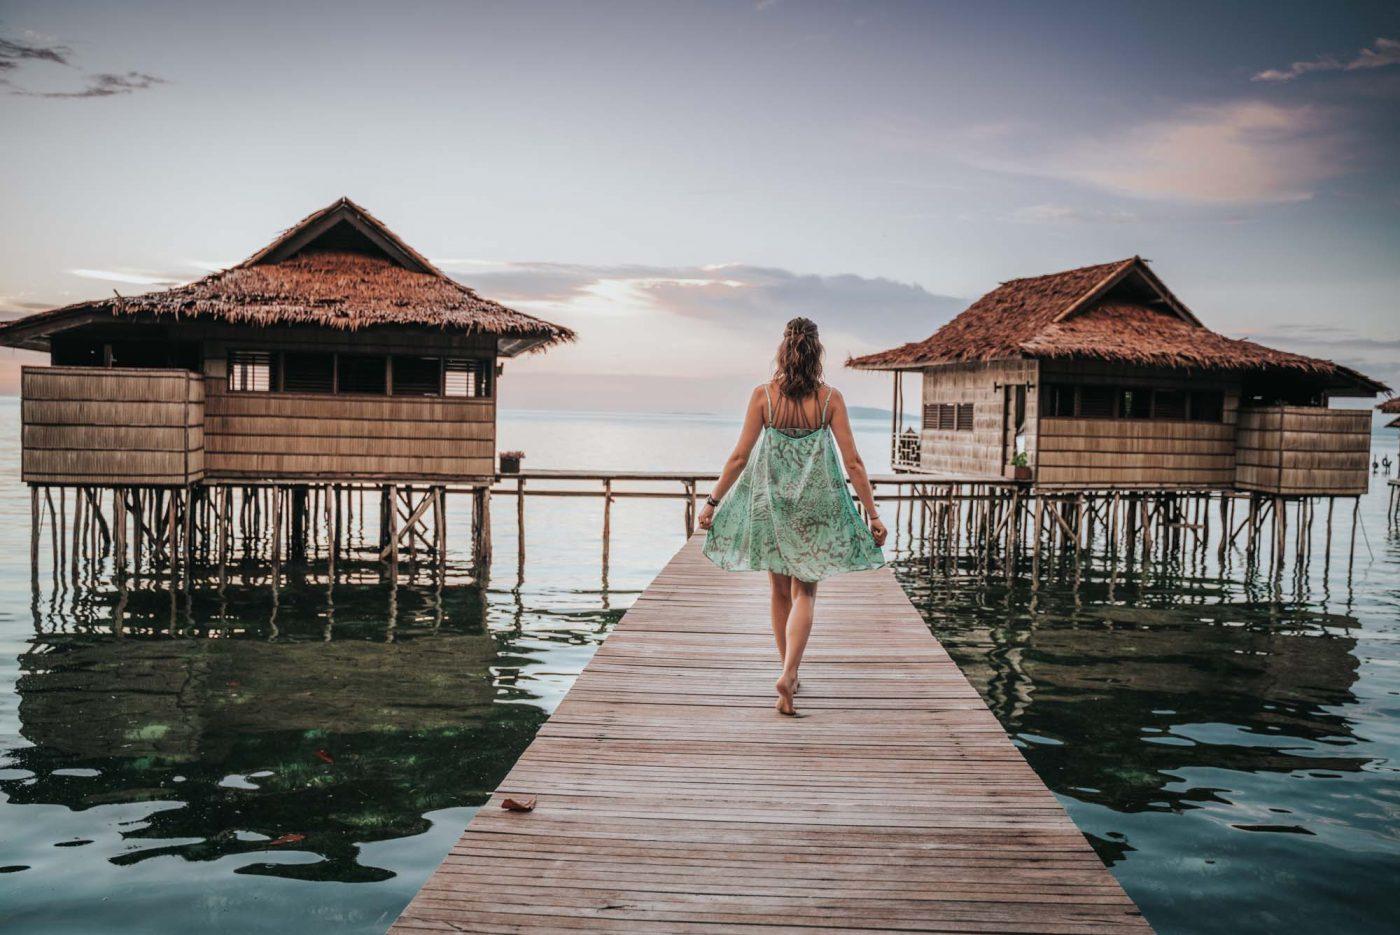 Bungalows at the Papua Paradise Eco Resort, Raja Ampat, Indonesia